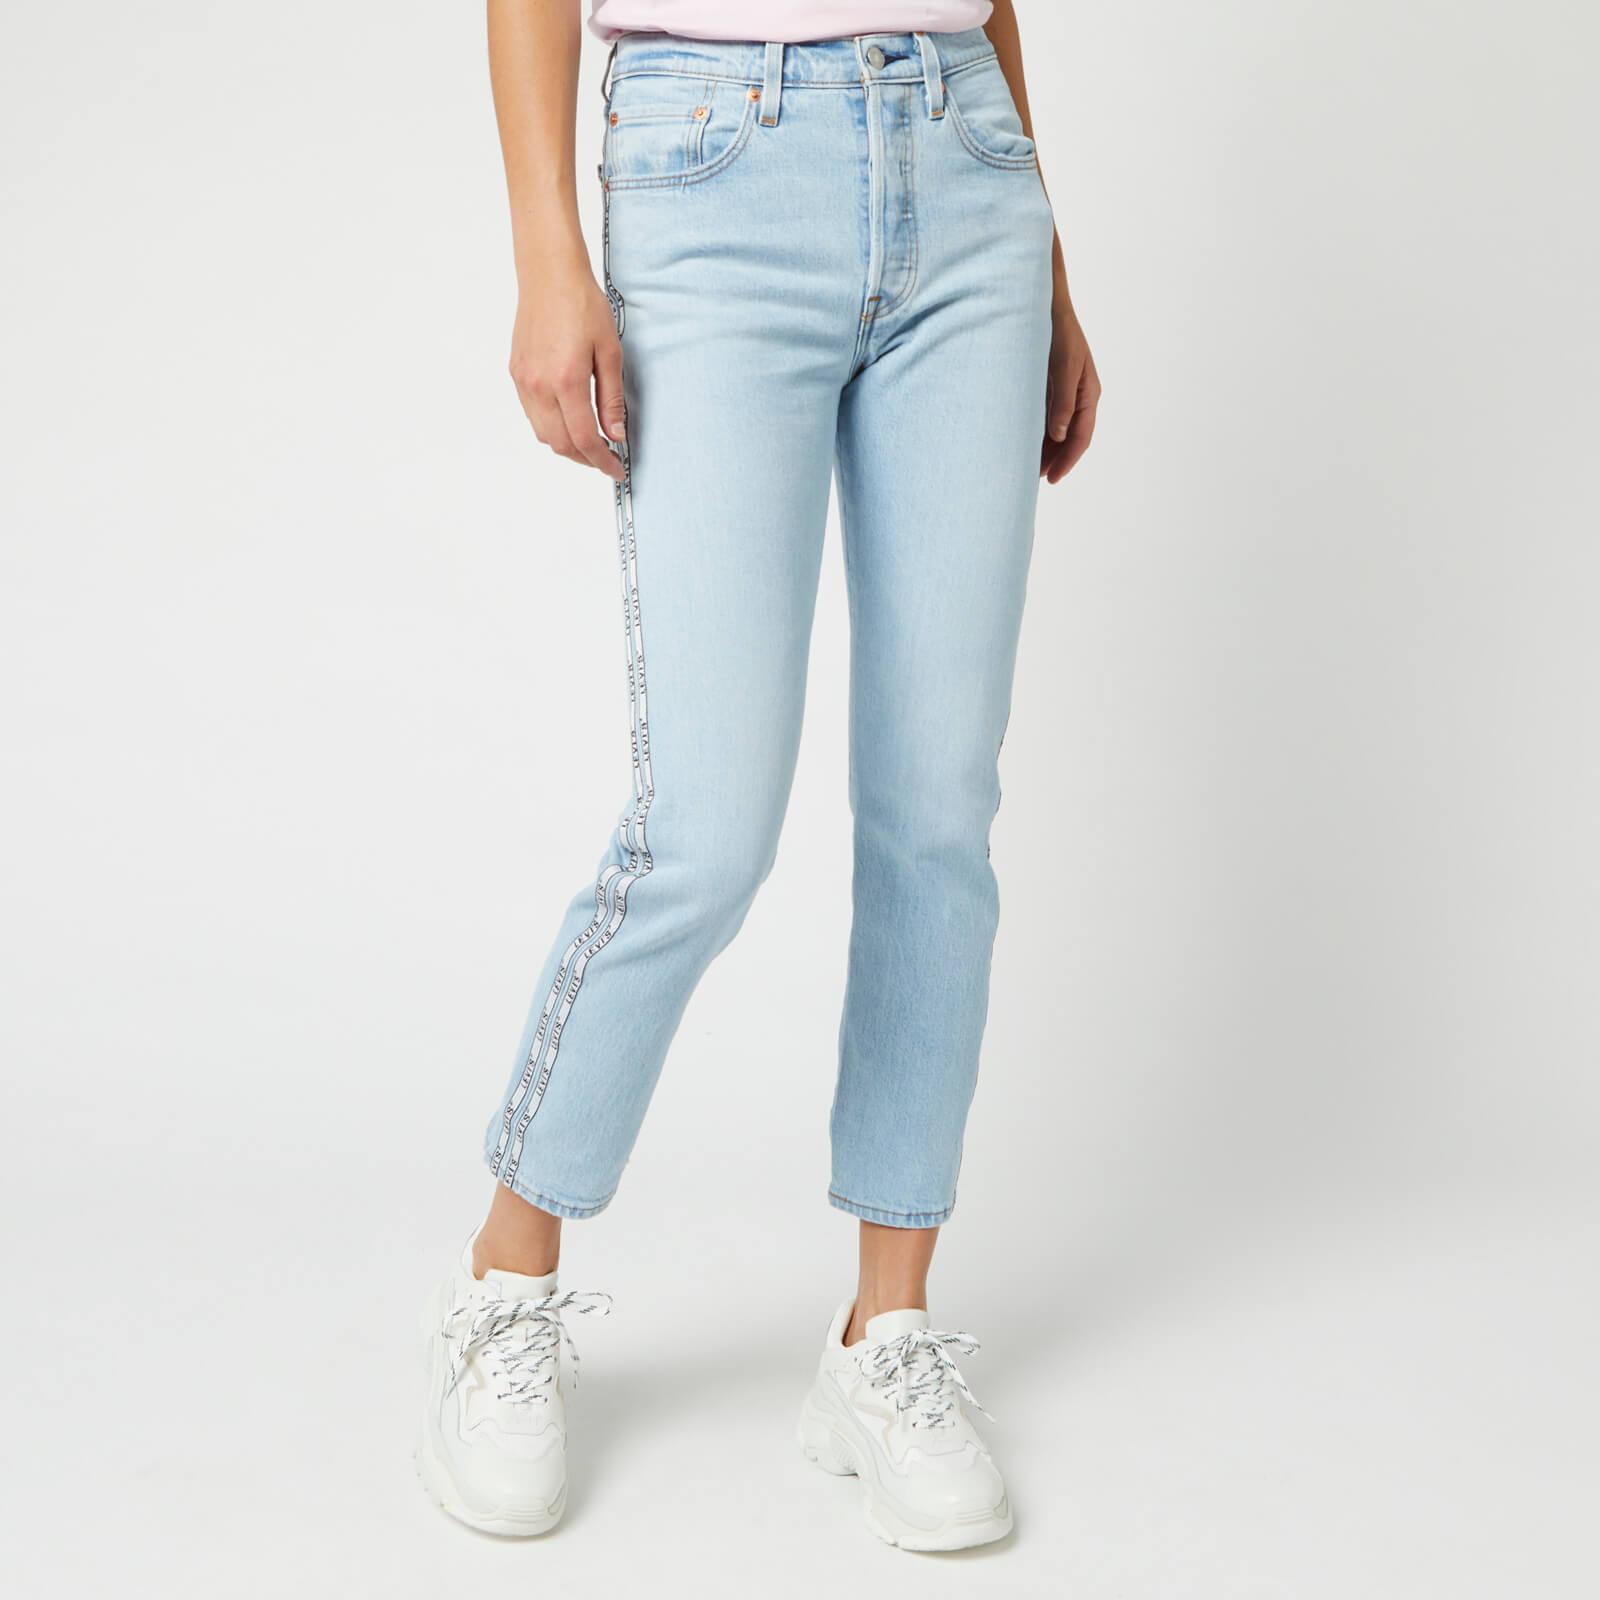 Levi's s 501 Crop Tape Jeans - Light Indigo - W27/L28 - Blue